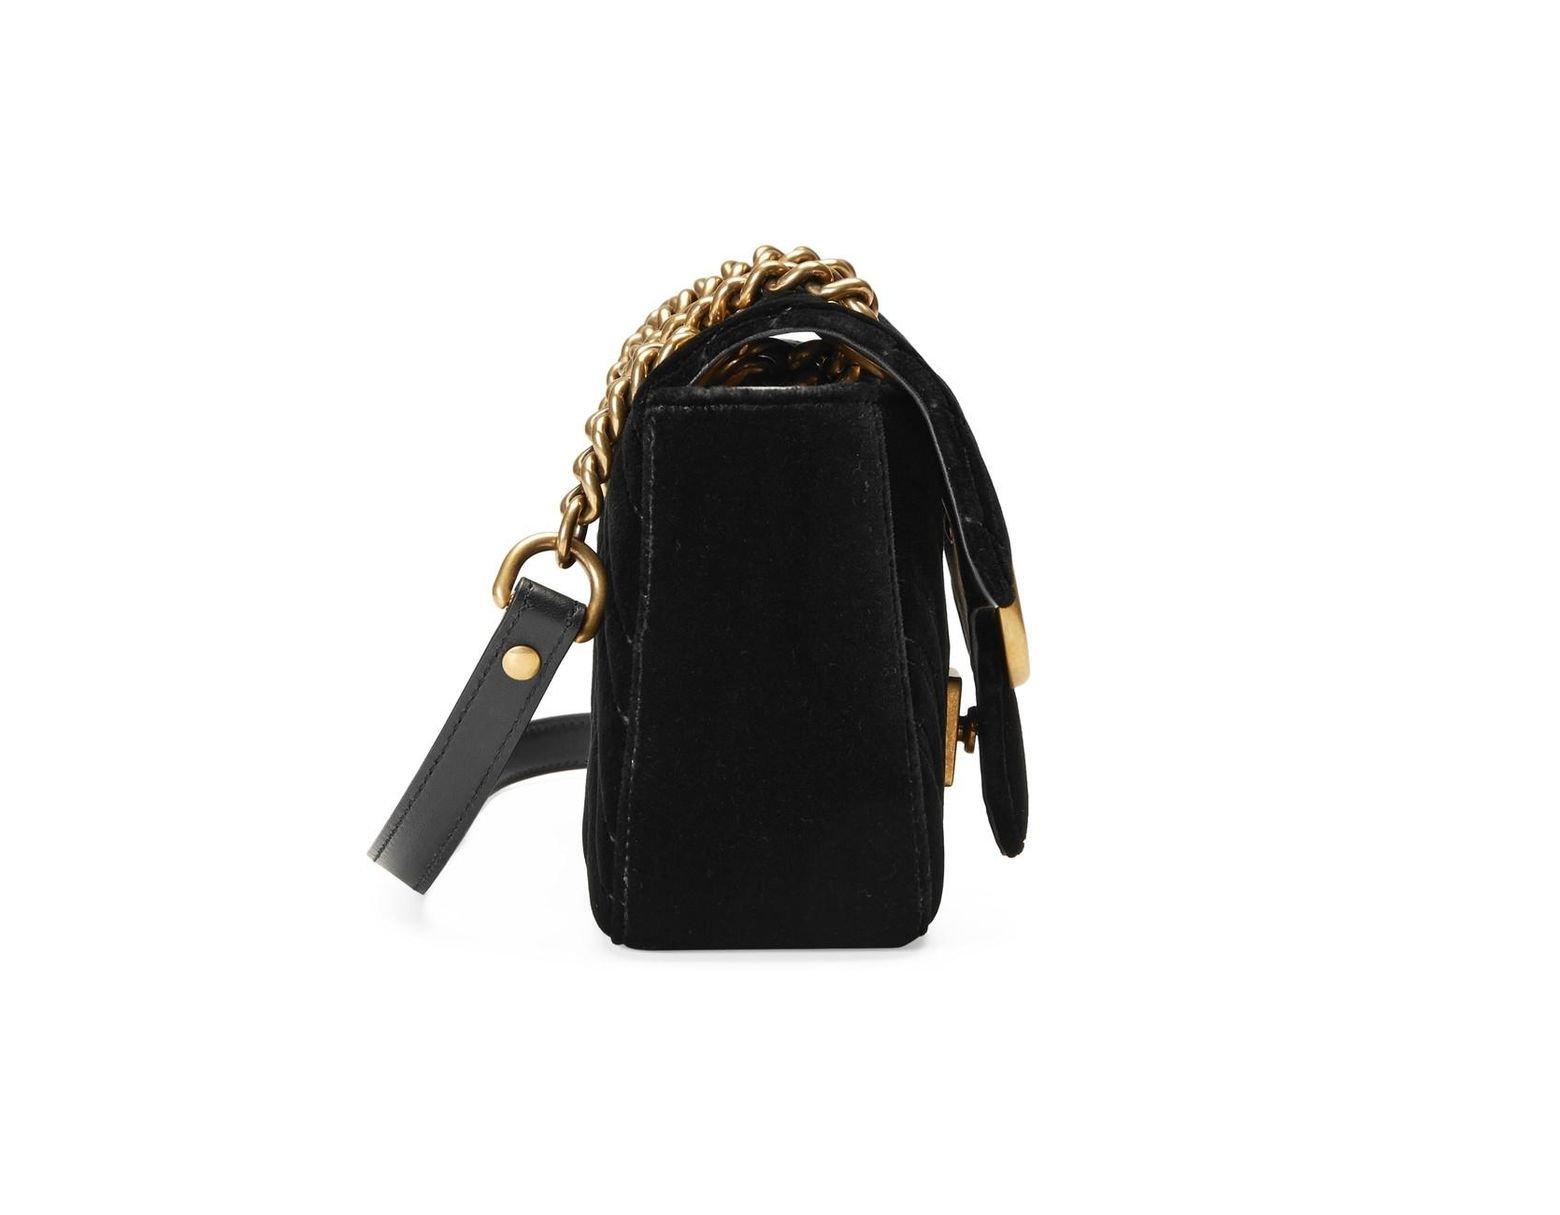 dd08f7a3c2f747 Gucci GG Marmont Velvet Mini Shoulder Bag in Black - Lyst